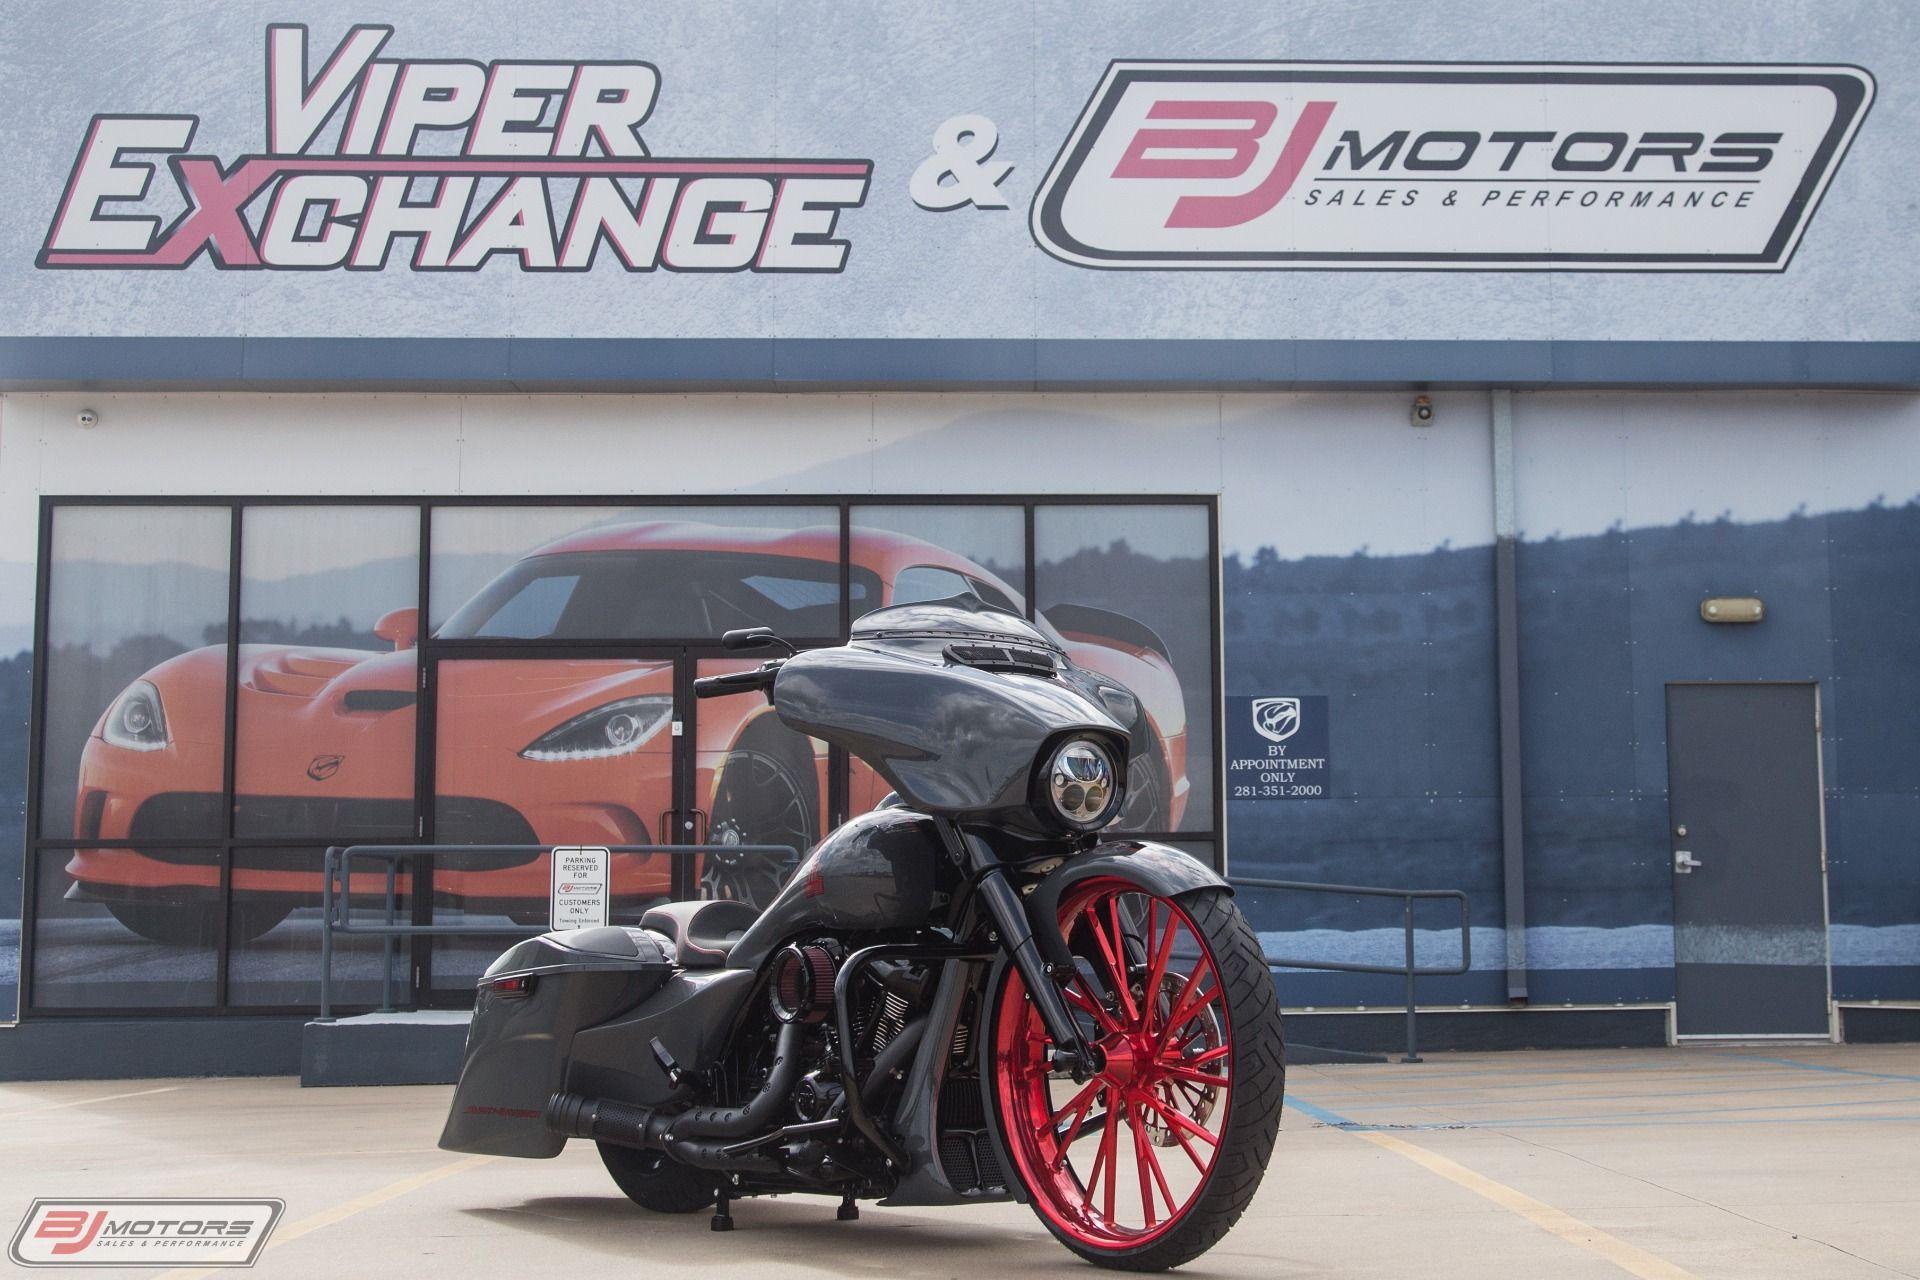 Used 2018 Harley Davidson Street Glide Custom Bagger Cars